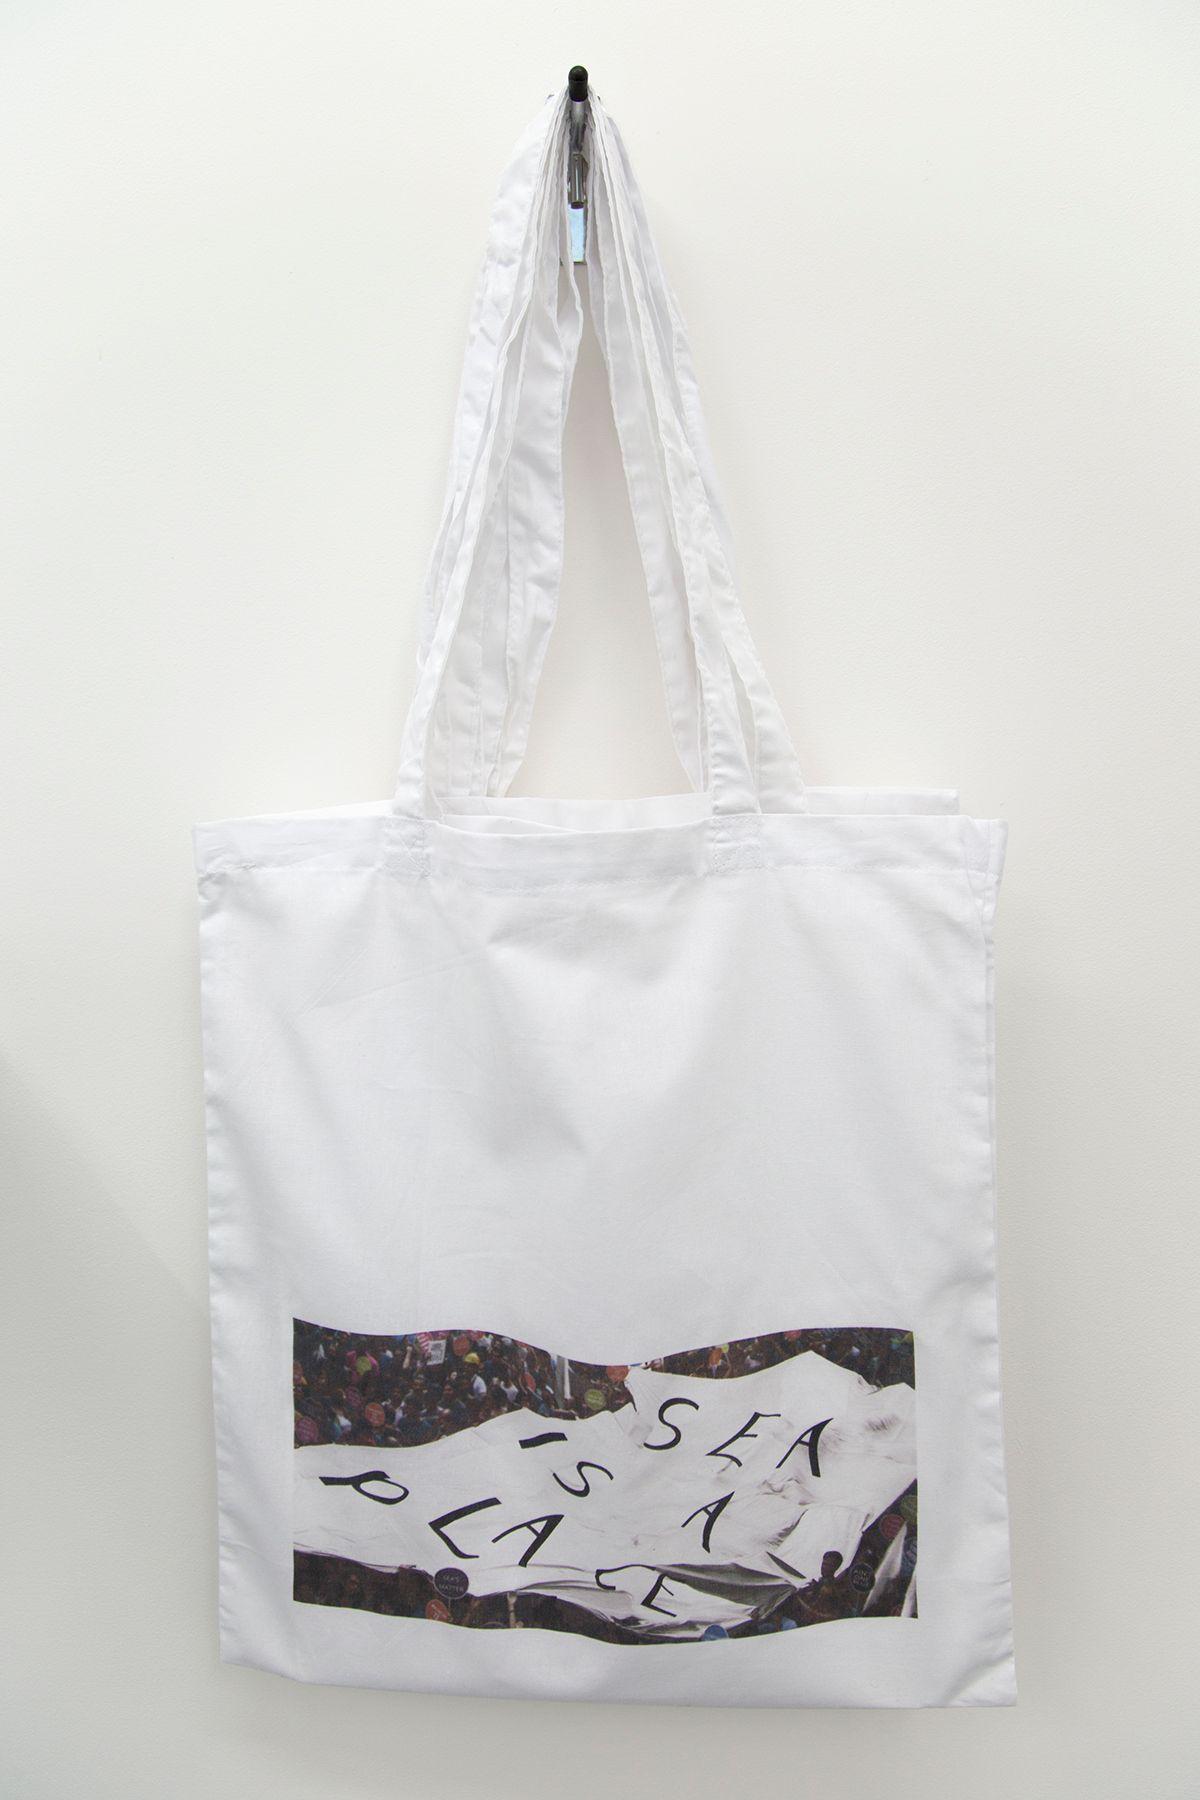 SEA IS A PLACE Sera Tansel Protest Tote Bag